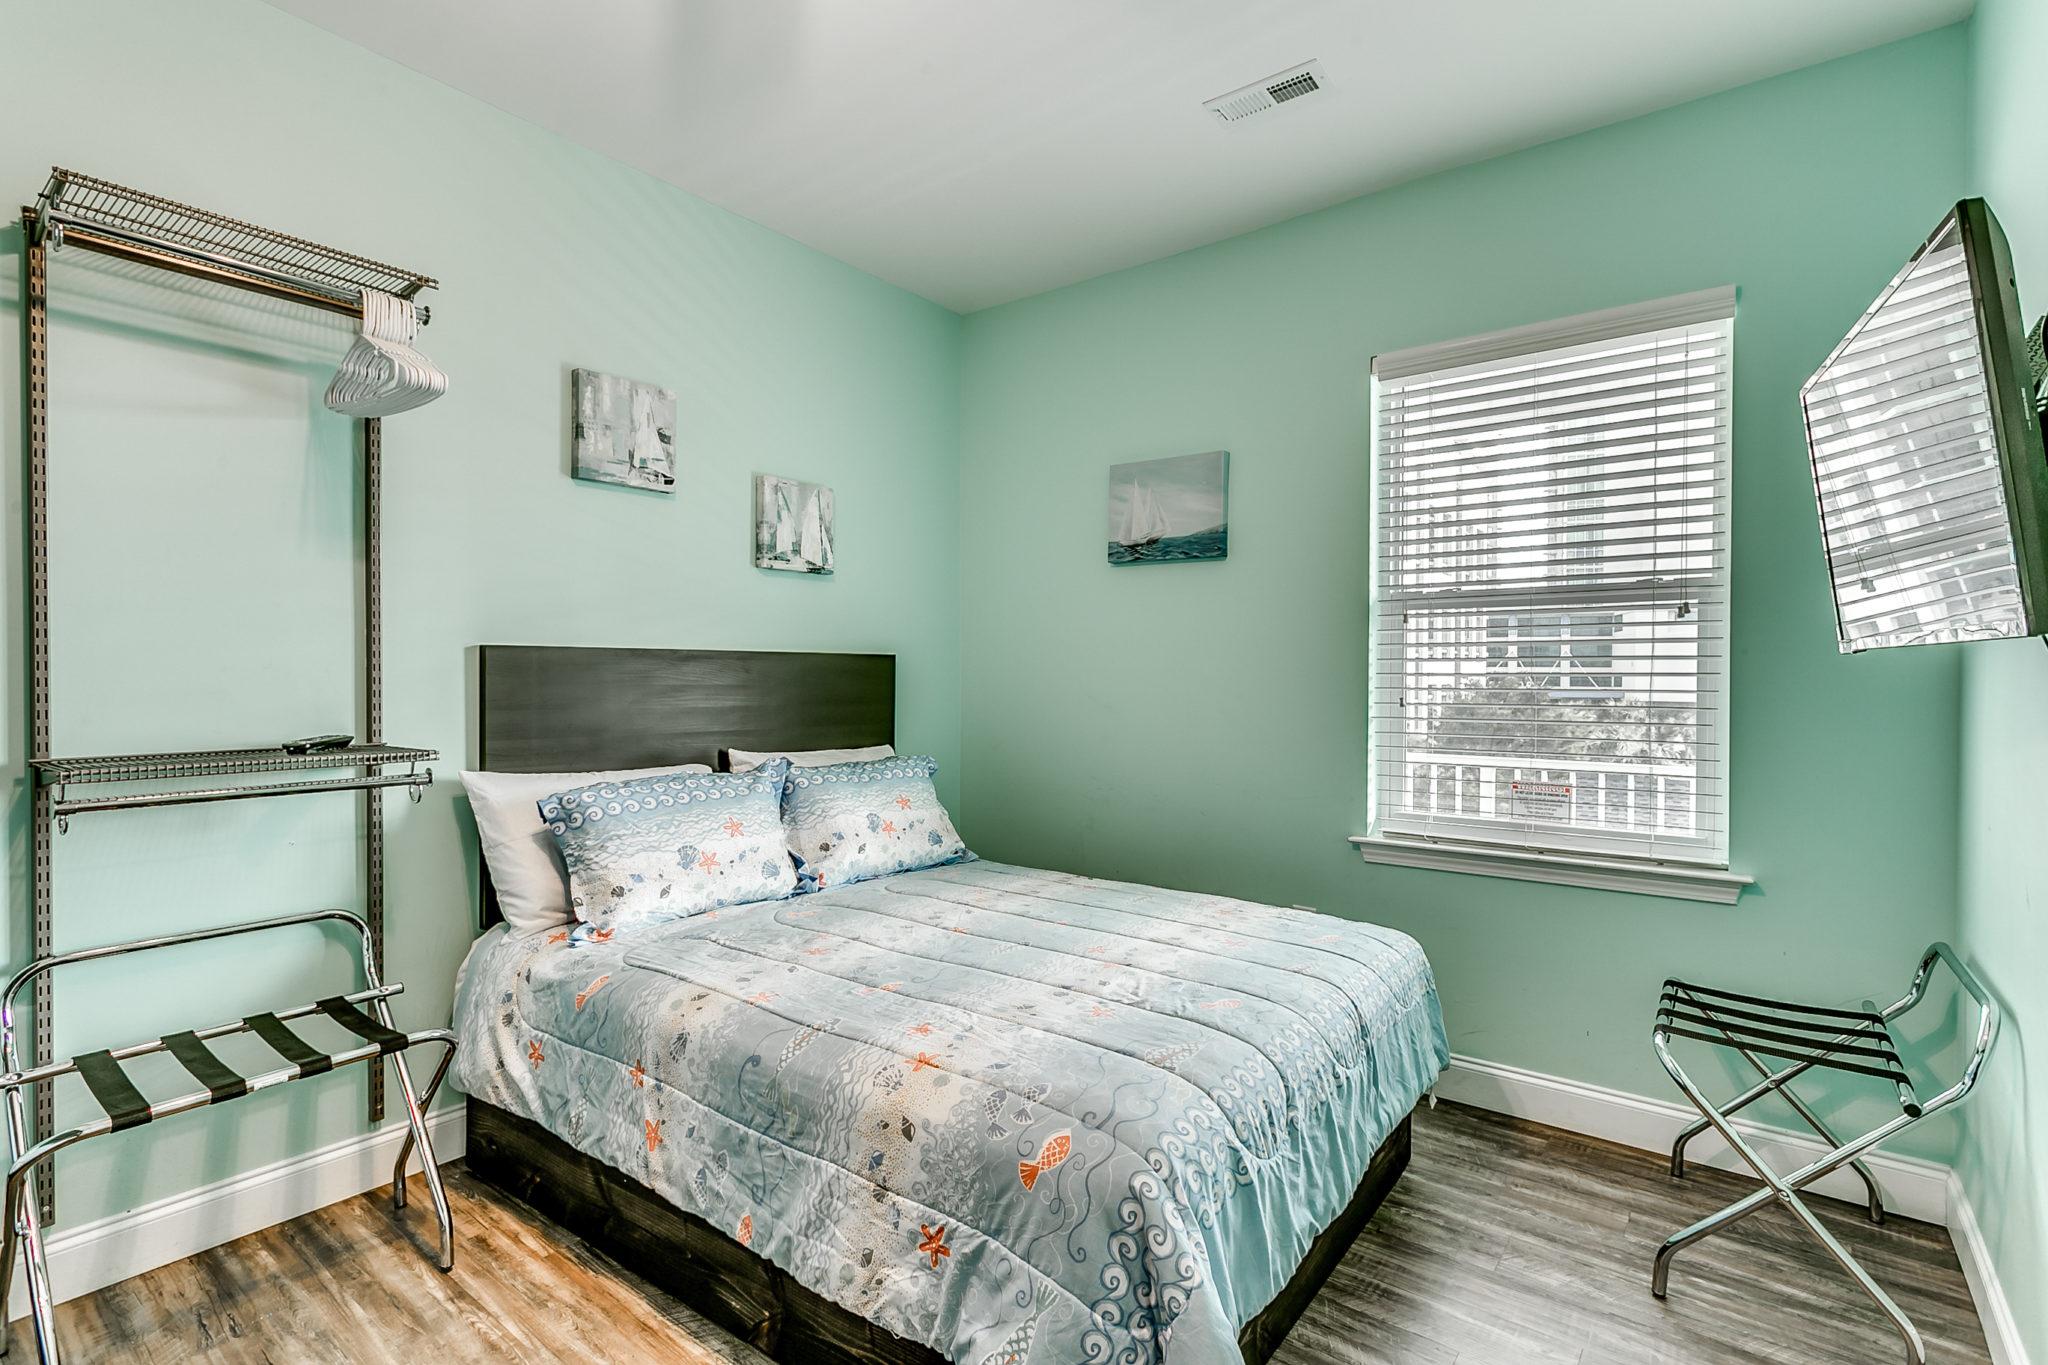 204 54th Ave - Unit B Bedroom